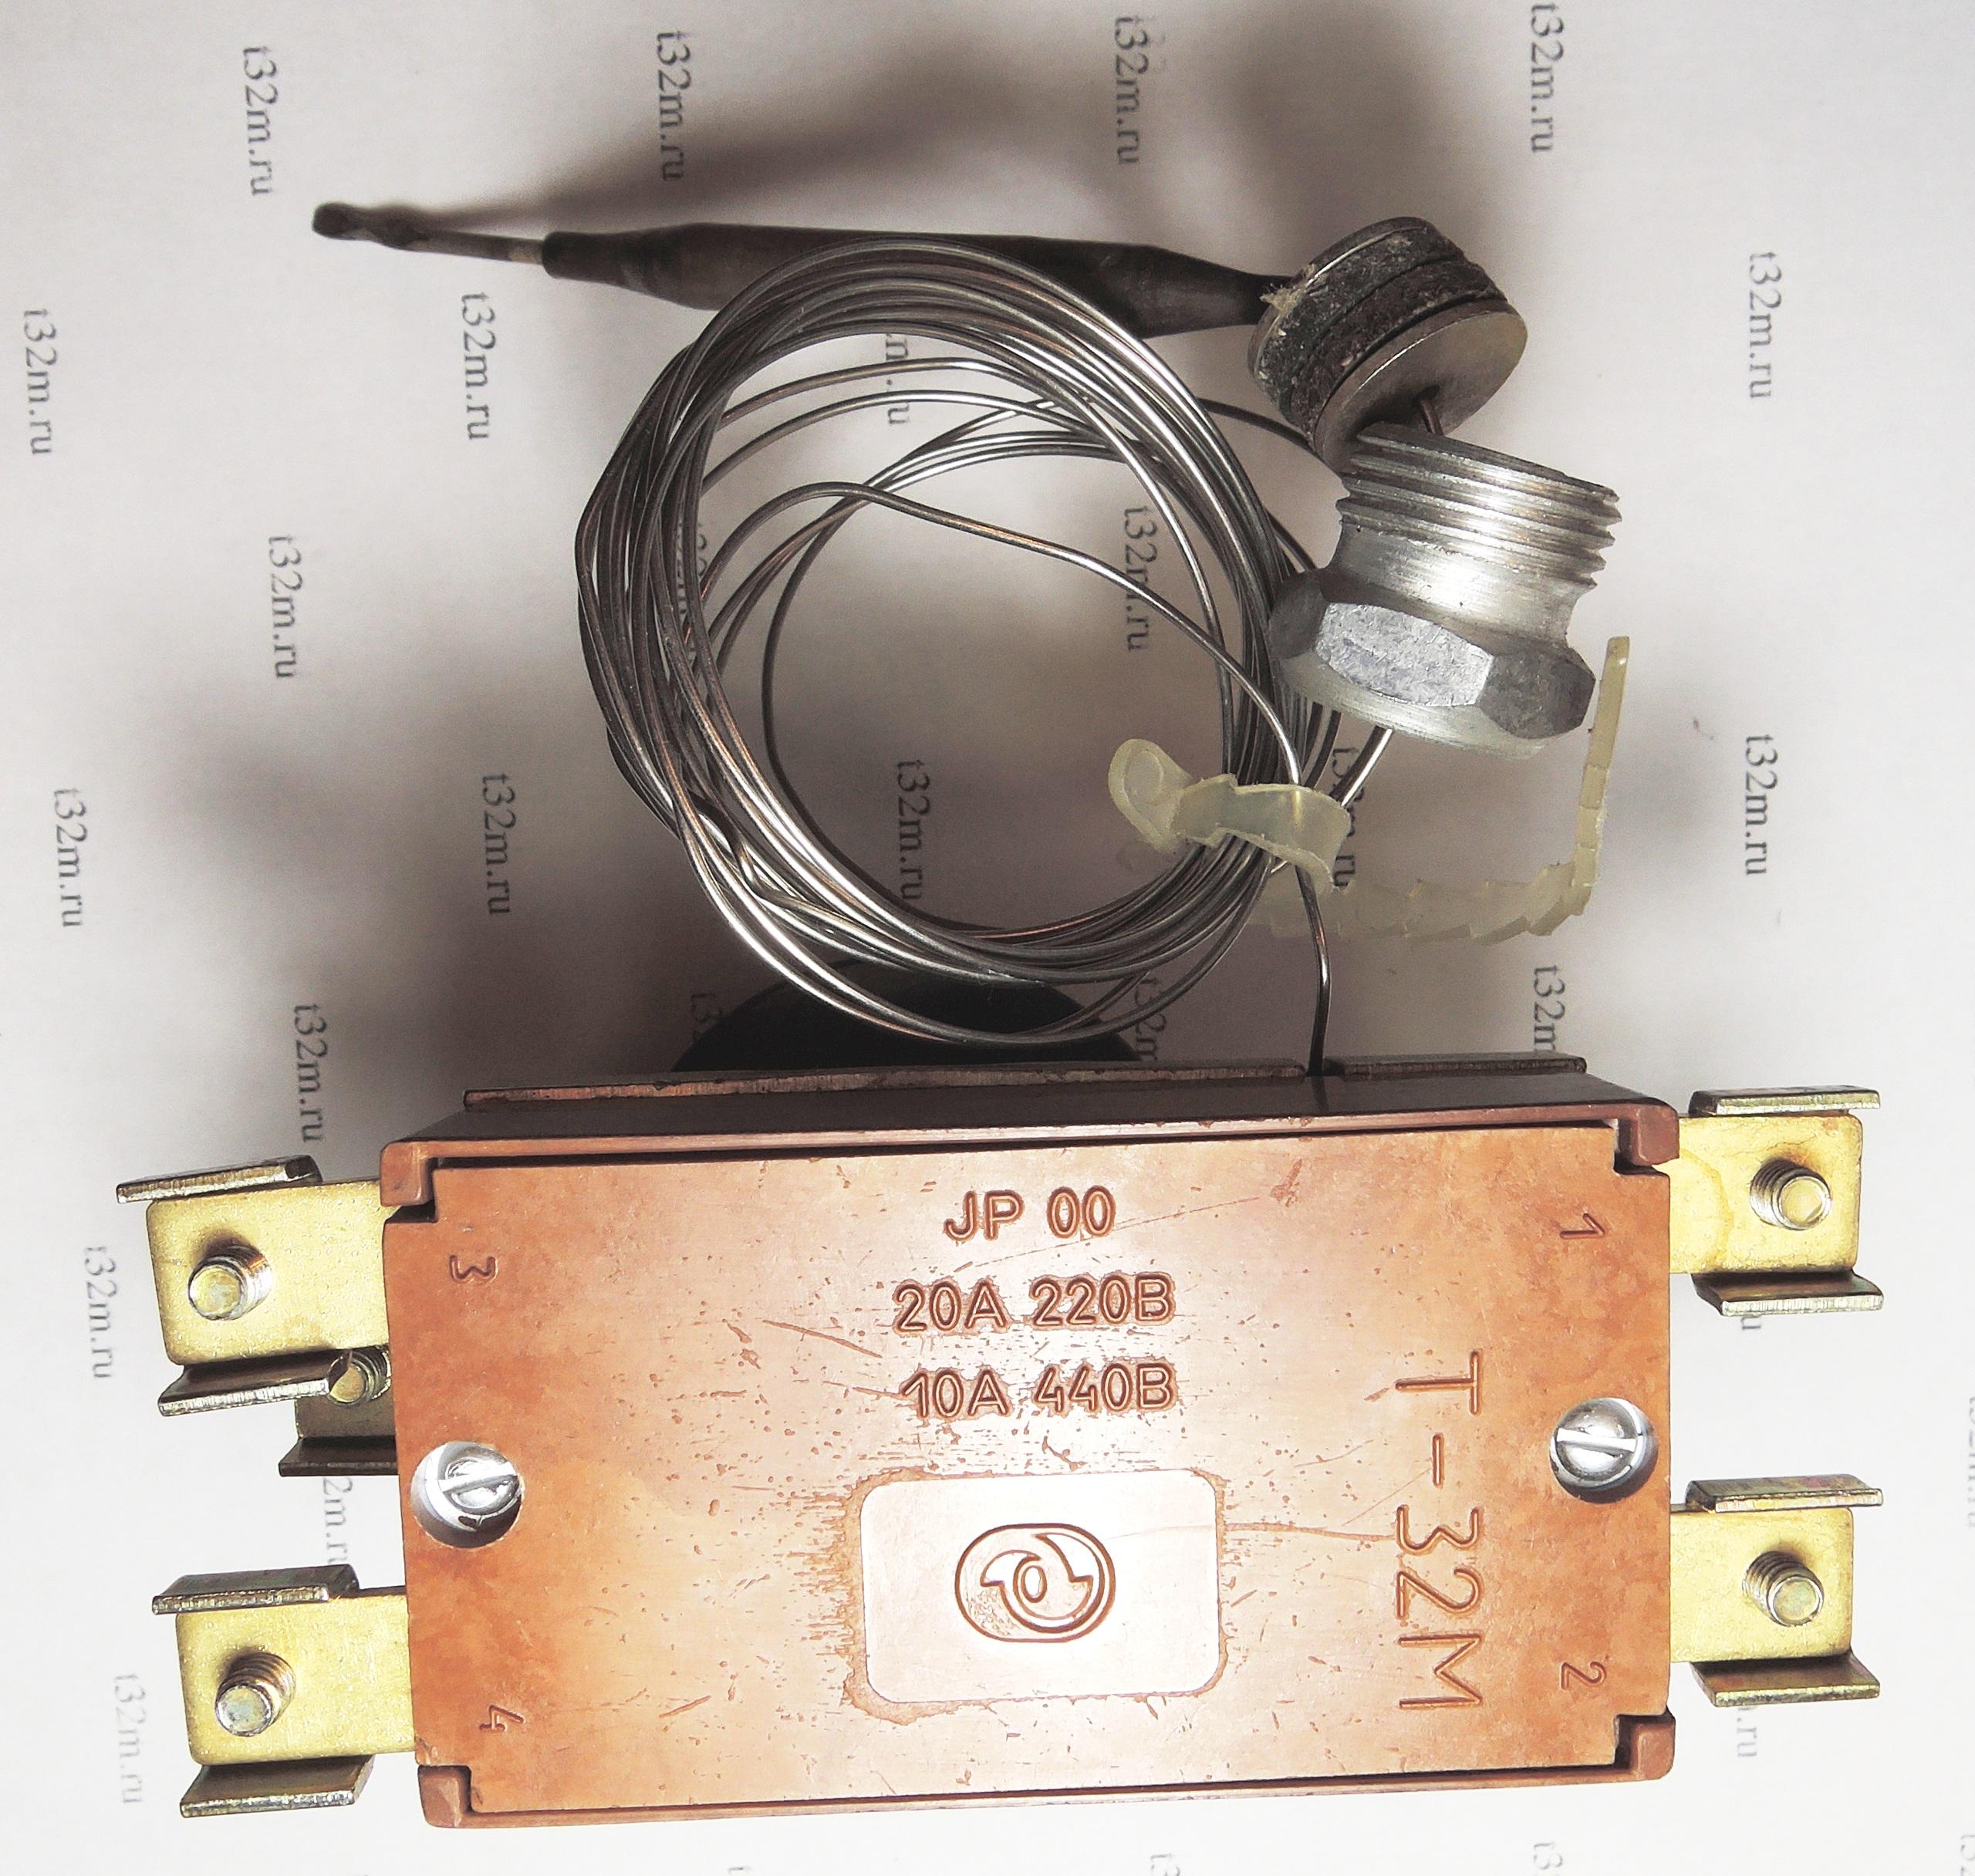 терморегулятор на два датчика схема